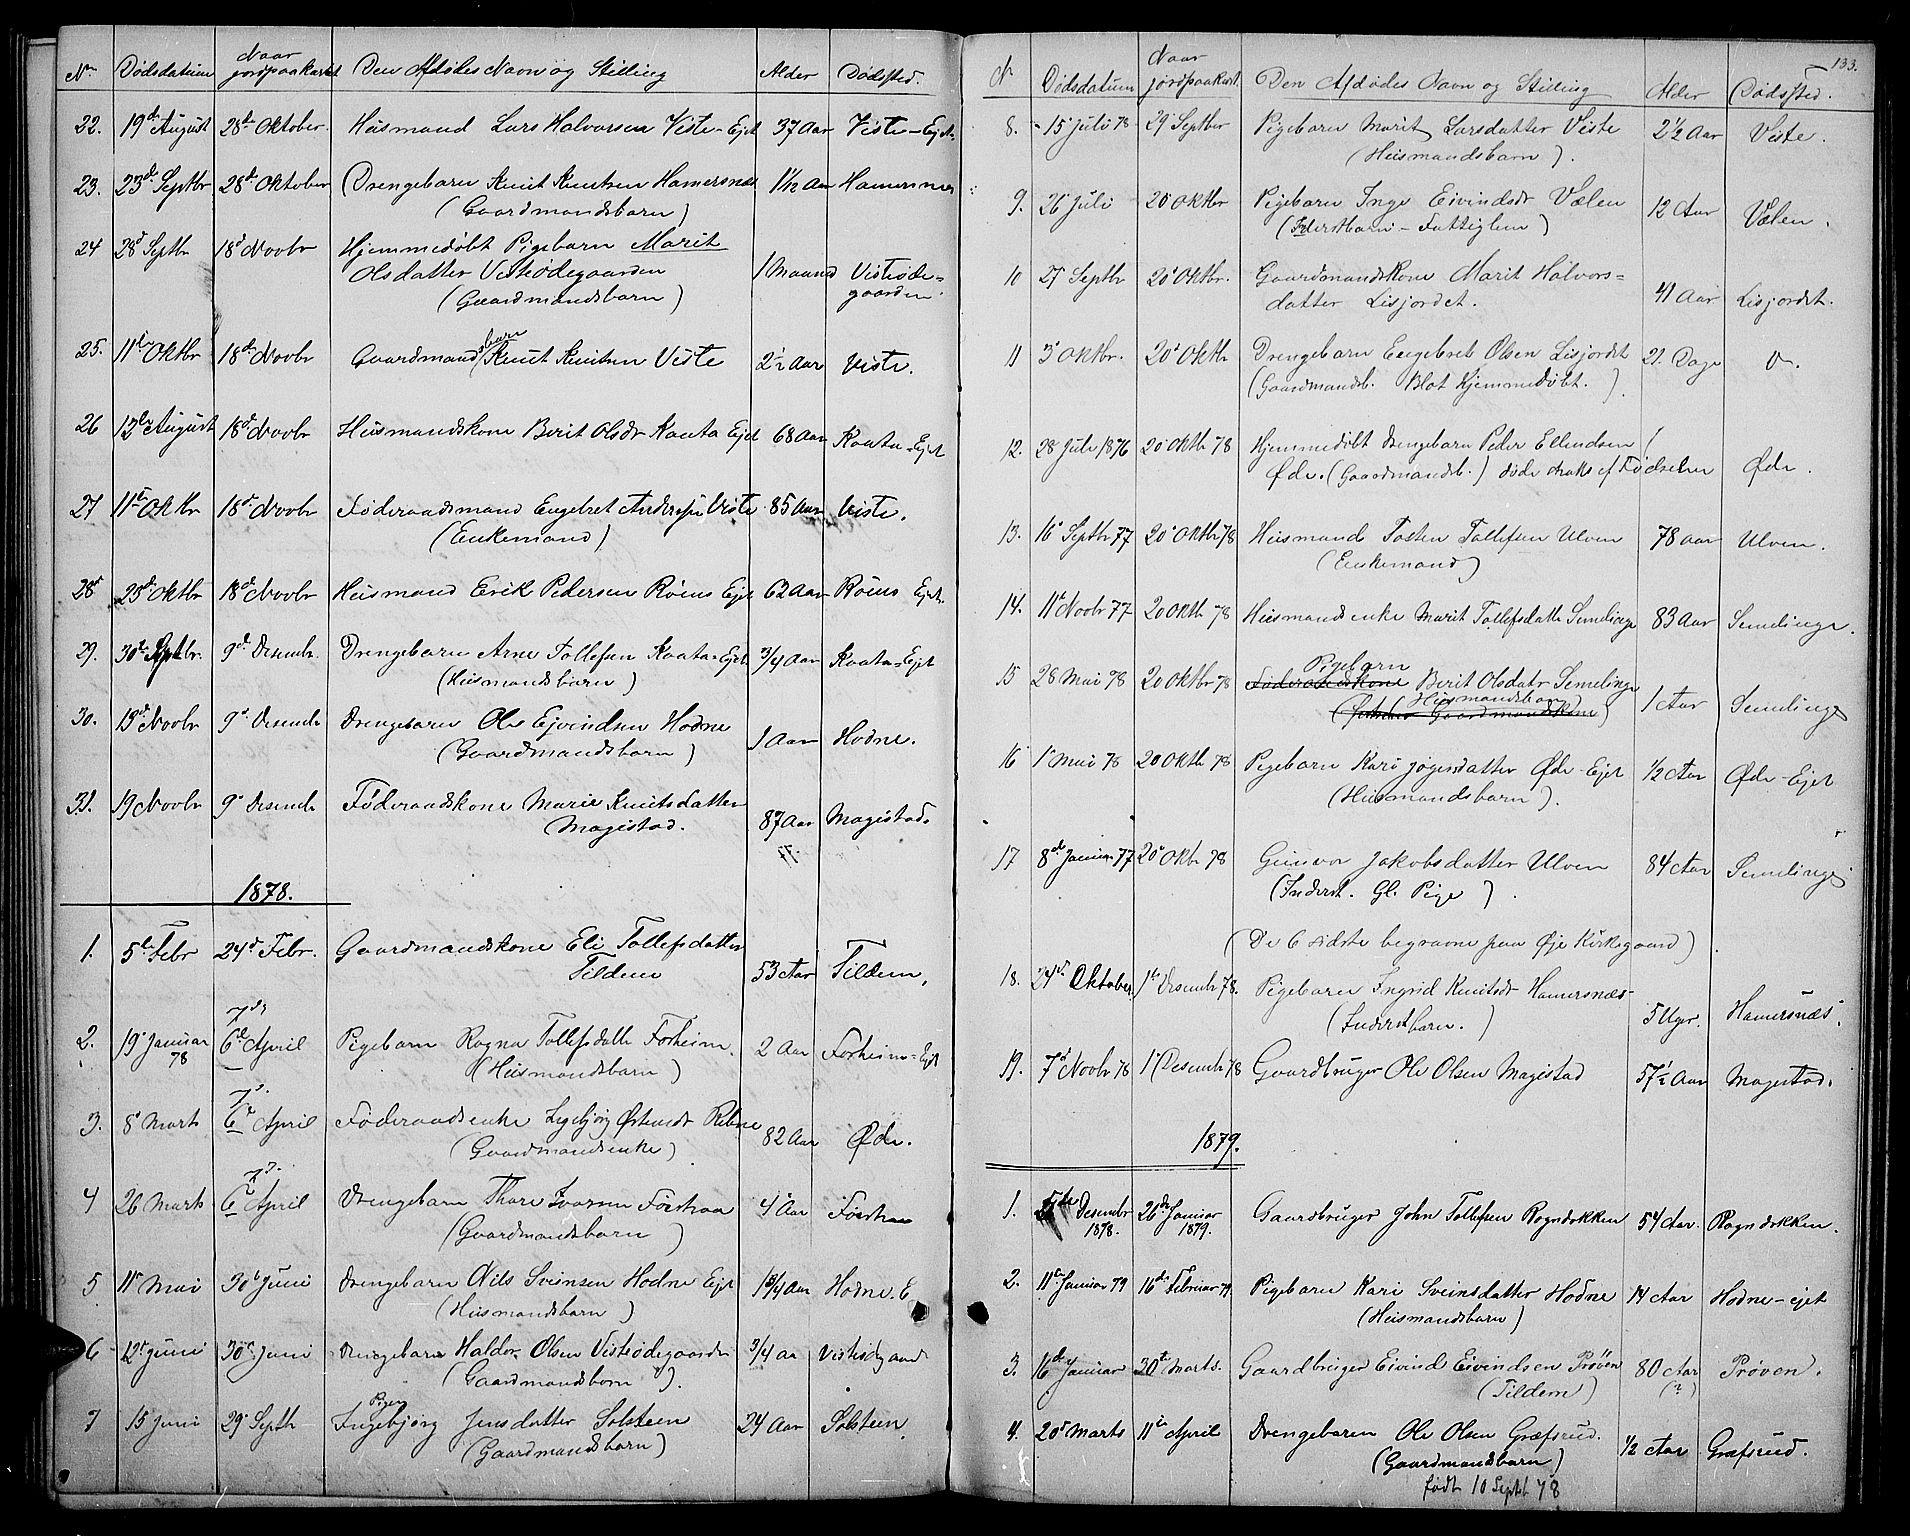 SAH, Vestre Slidre prestekontor, Klokkerbok nr. 3, 1869-1882, s. 133